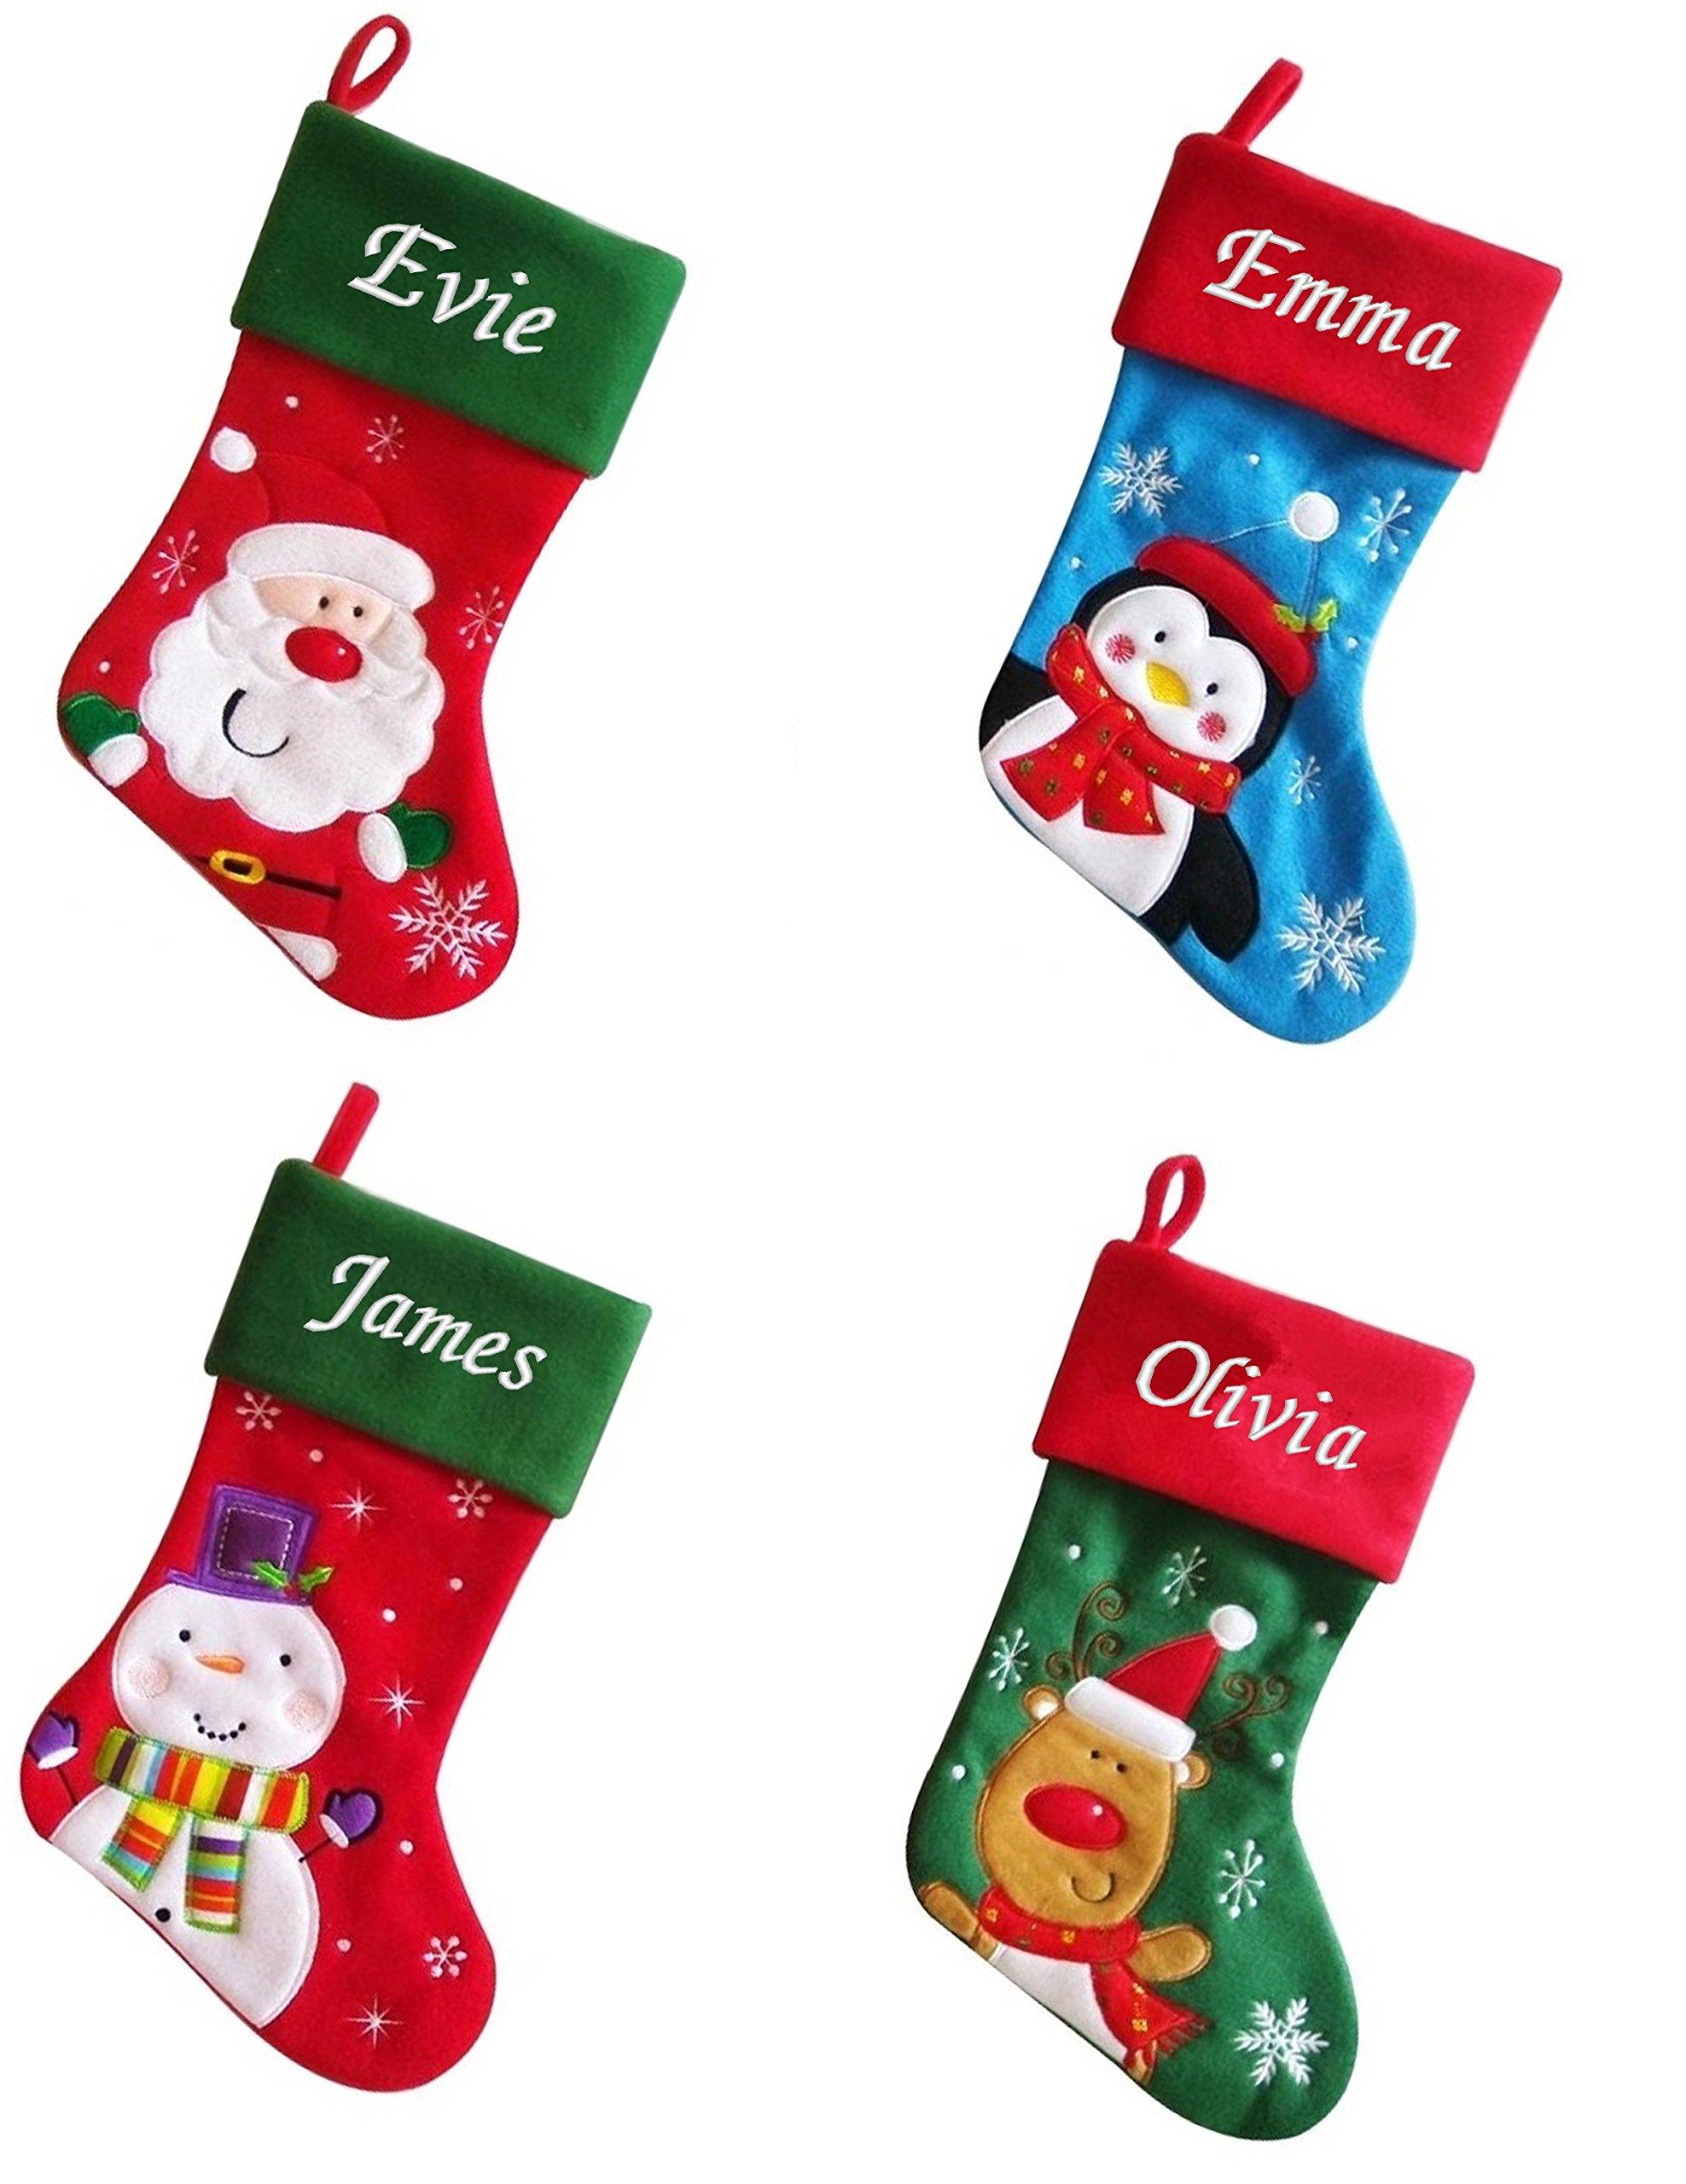 Embroidered Christmas Stockings.Luxury Deluxe Personalised Embroidered Christmas Santa Penguin Snowman Reindeer Xmas Stocking